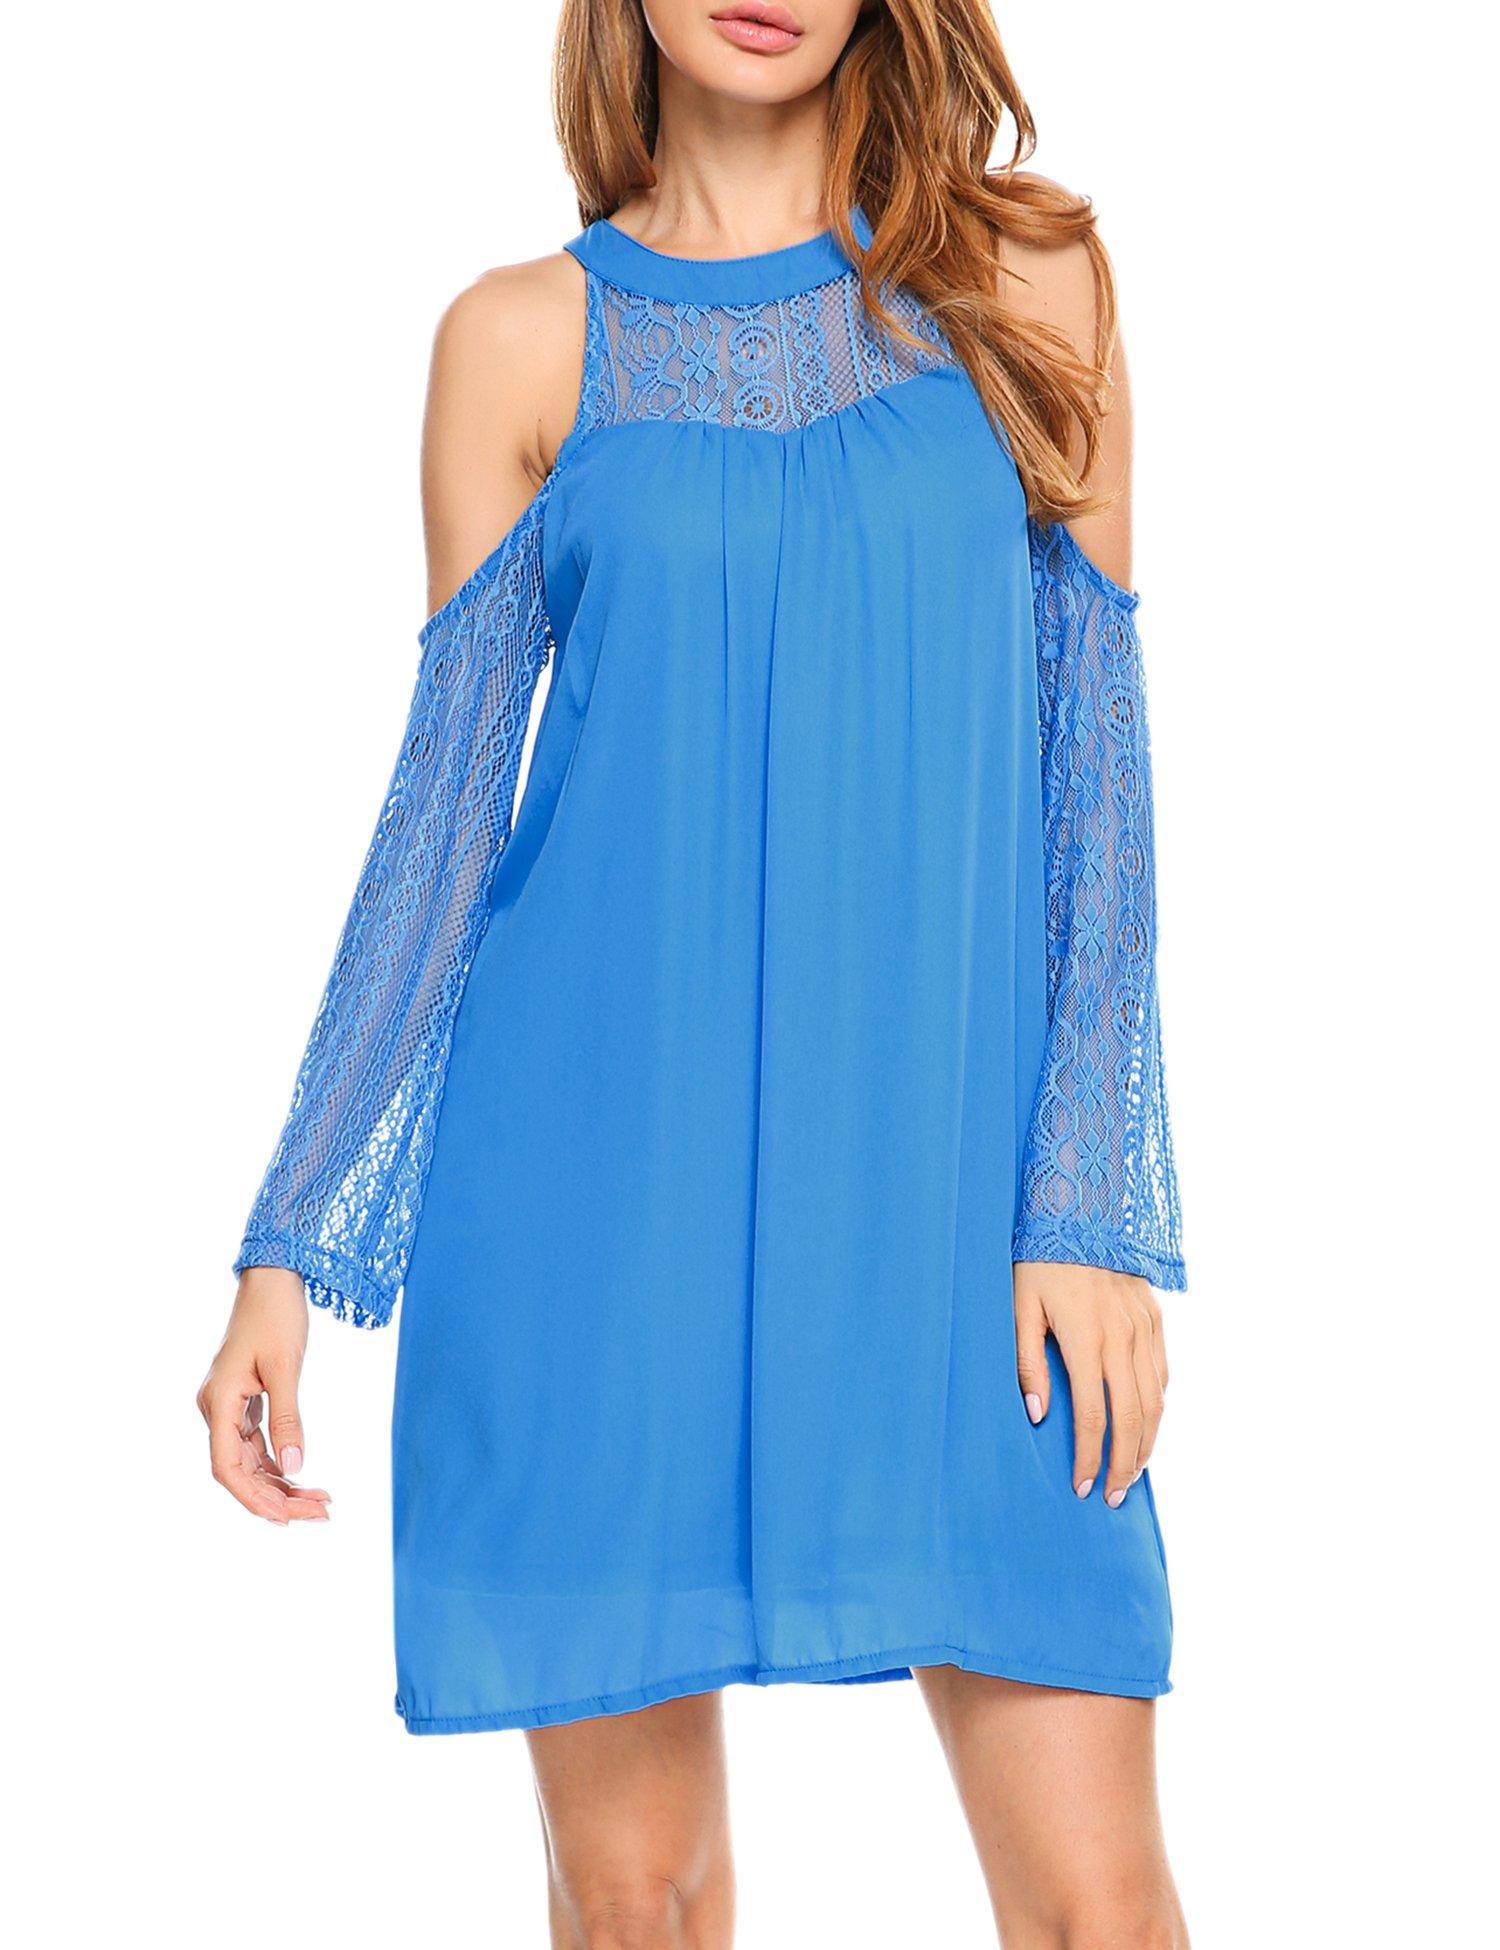 Available at Amazon: ACEVOG Women's Retro Floral Lace Dress 3/4 Sleeve Chiffon Maxi Dresses